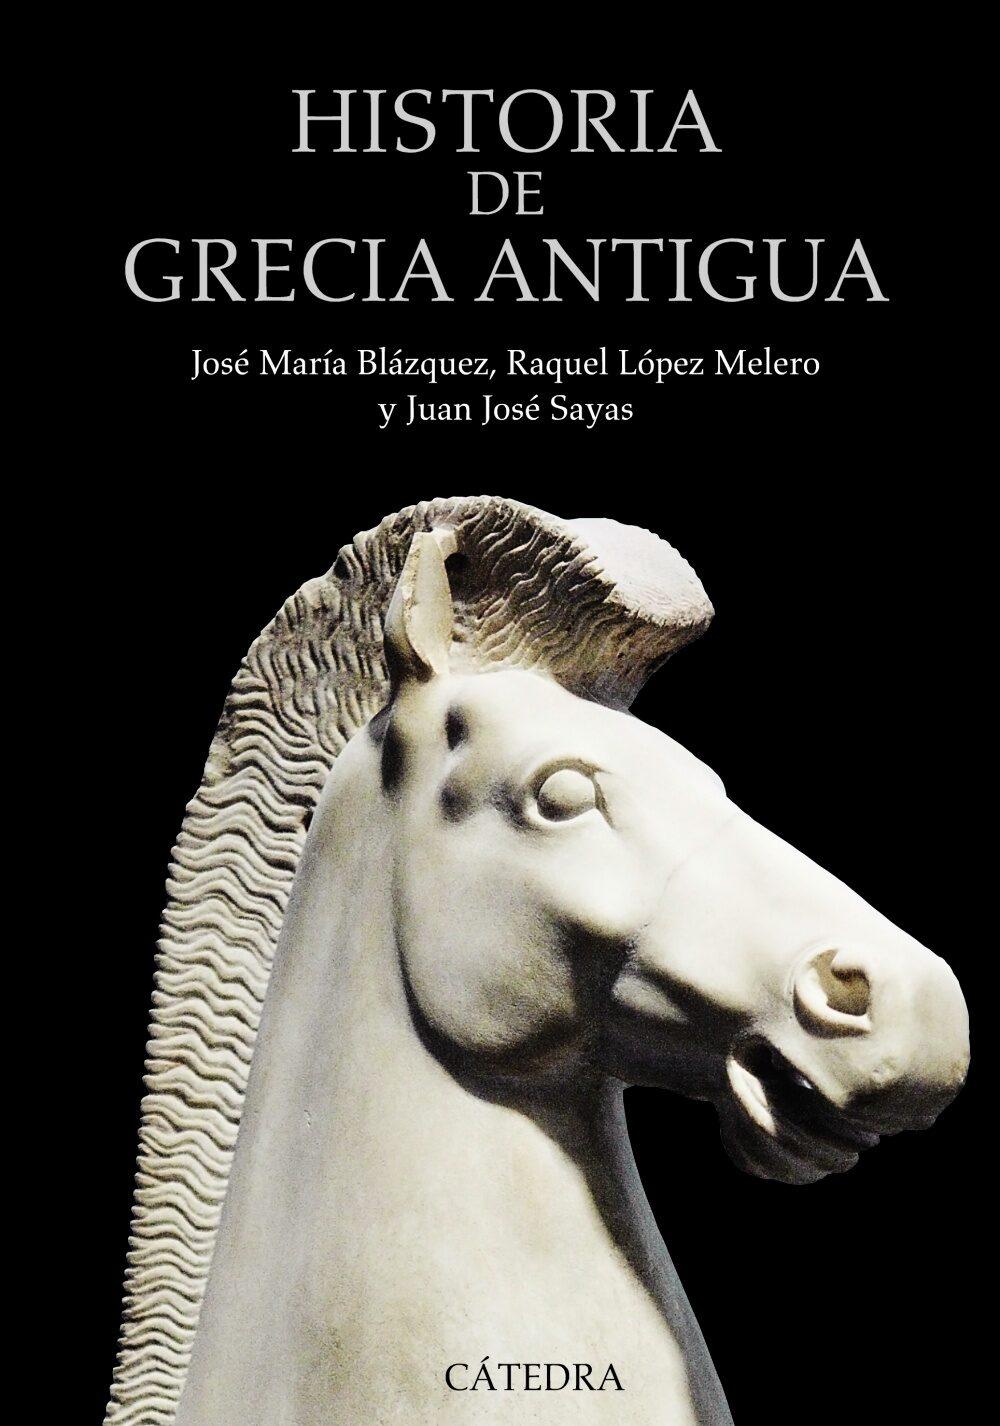 Historia de la Grecia antigua (papel)